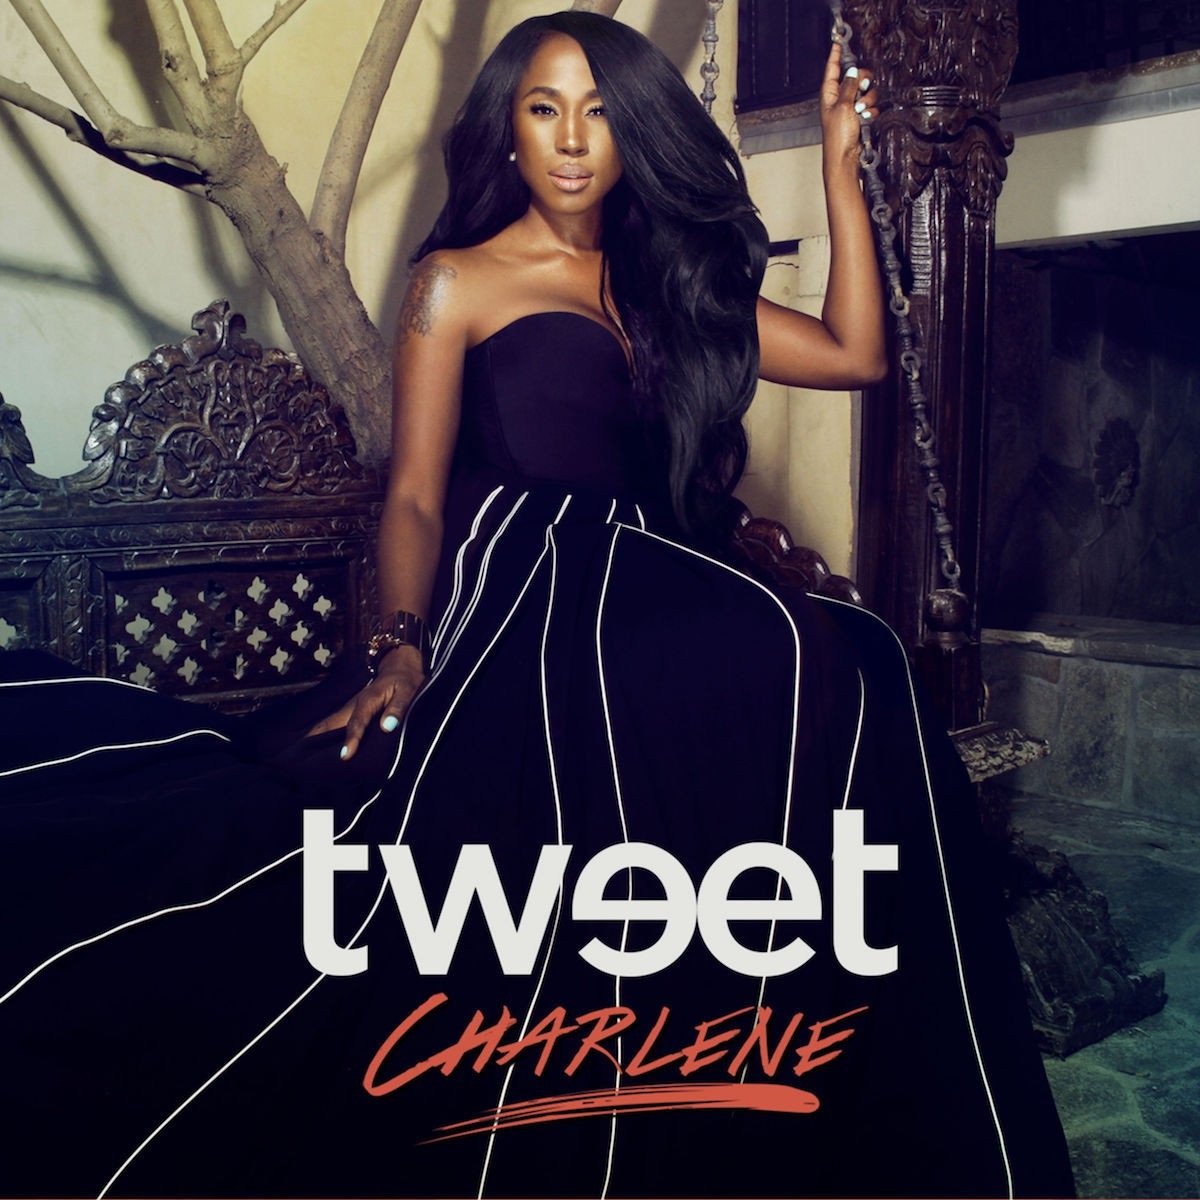 tweet-charlene-new-album-missy-elliott-somebody-else-will